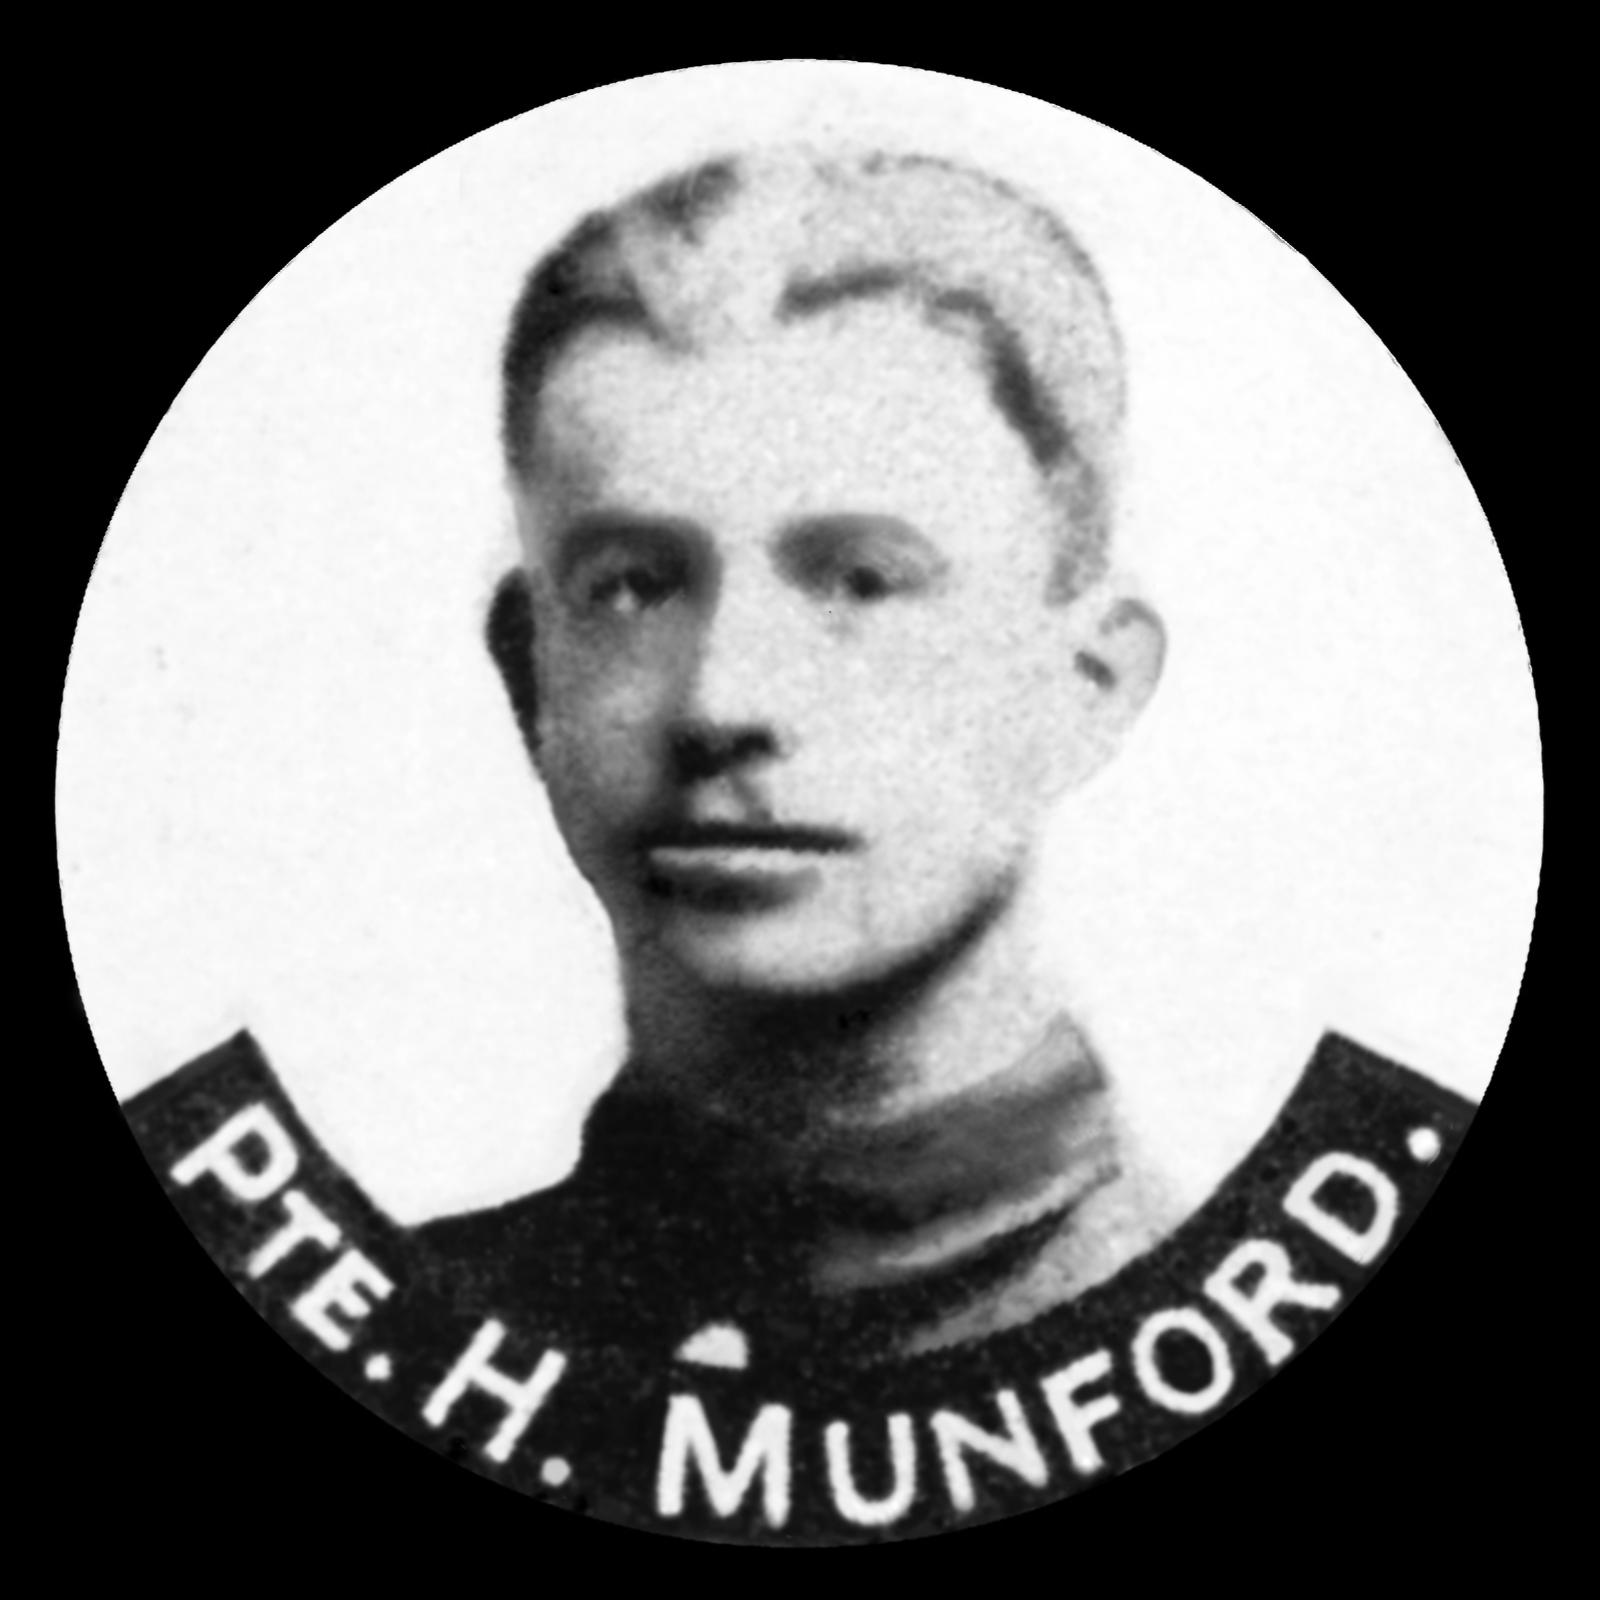 MUNFORD Henry